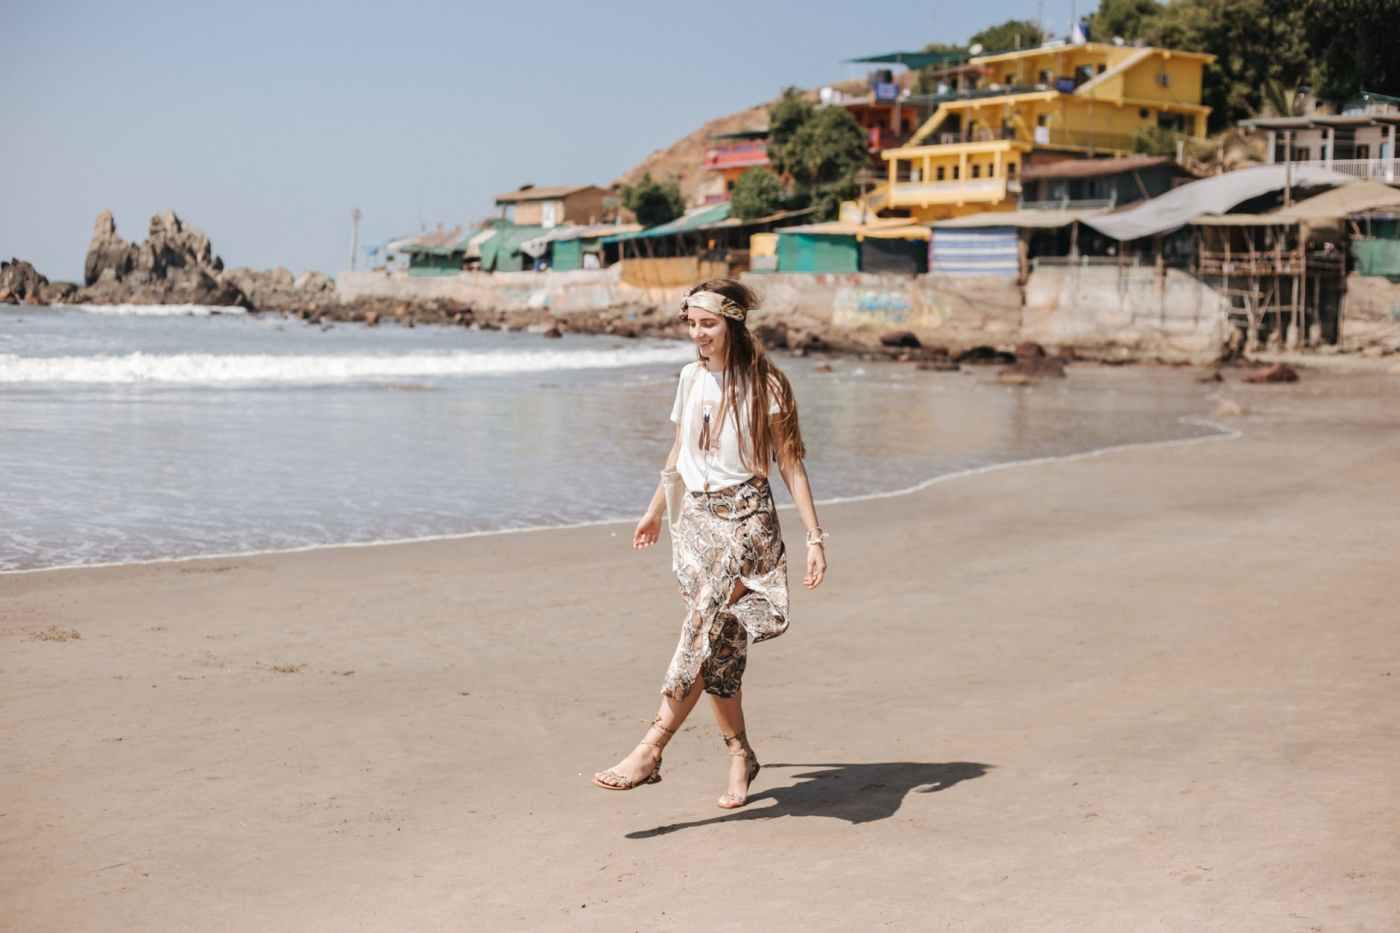 a beautiful woman walking on the beach